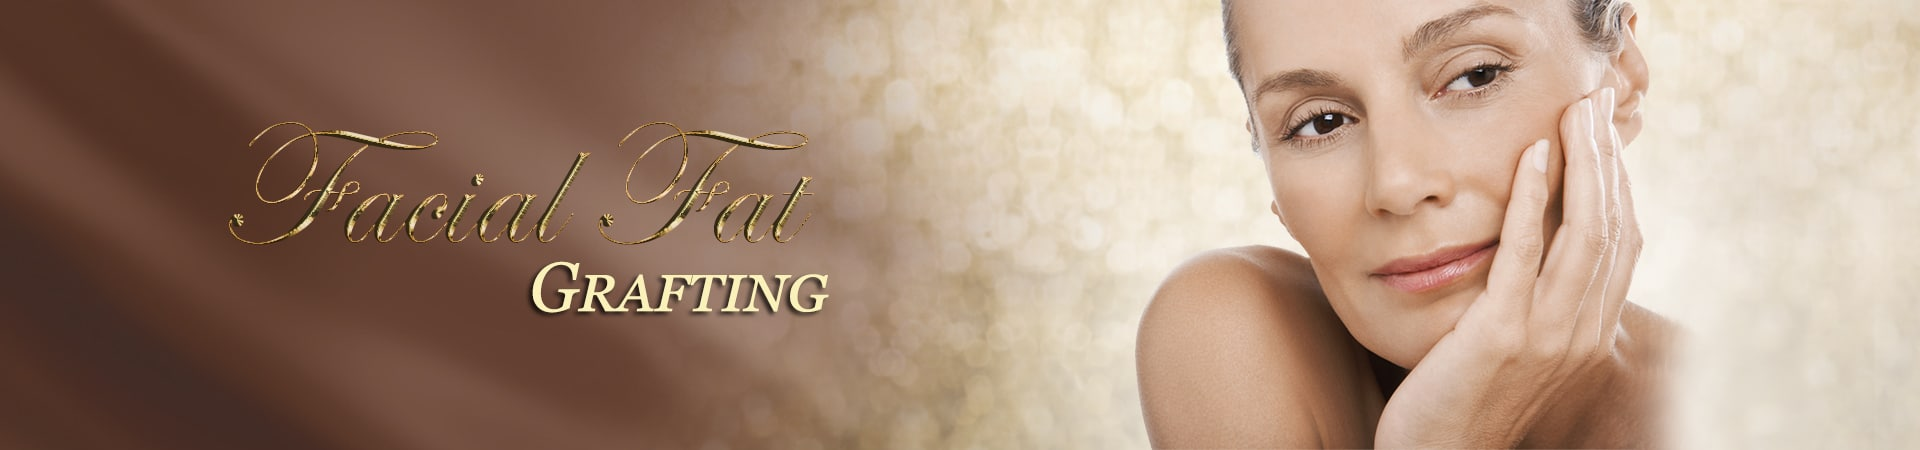 facial fat grafting - banner